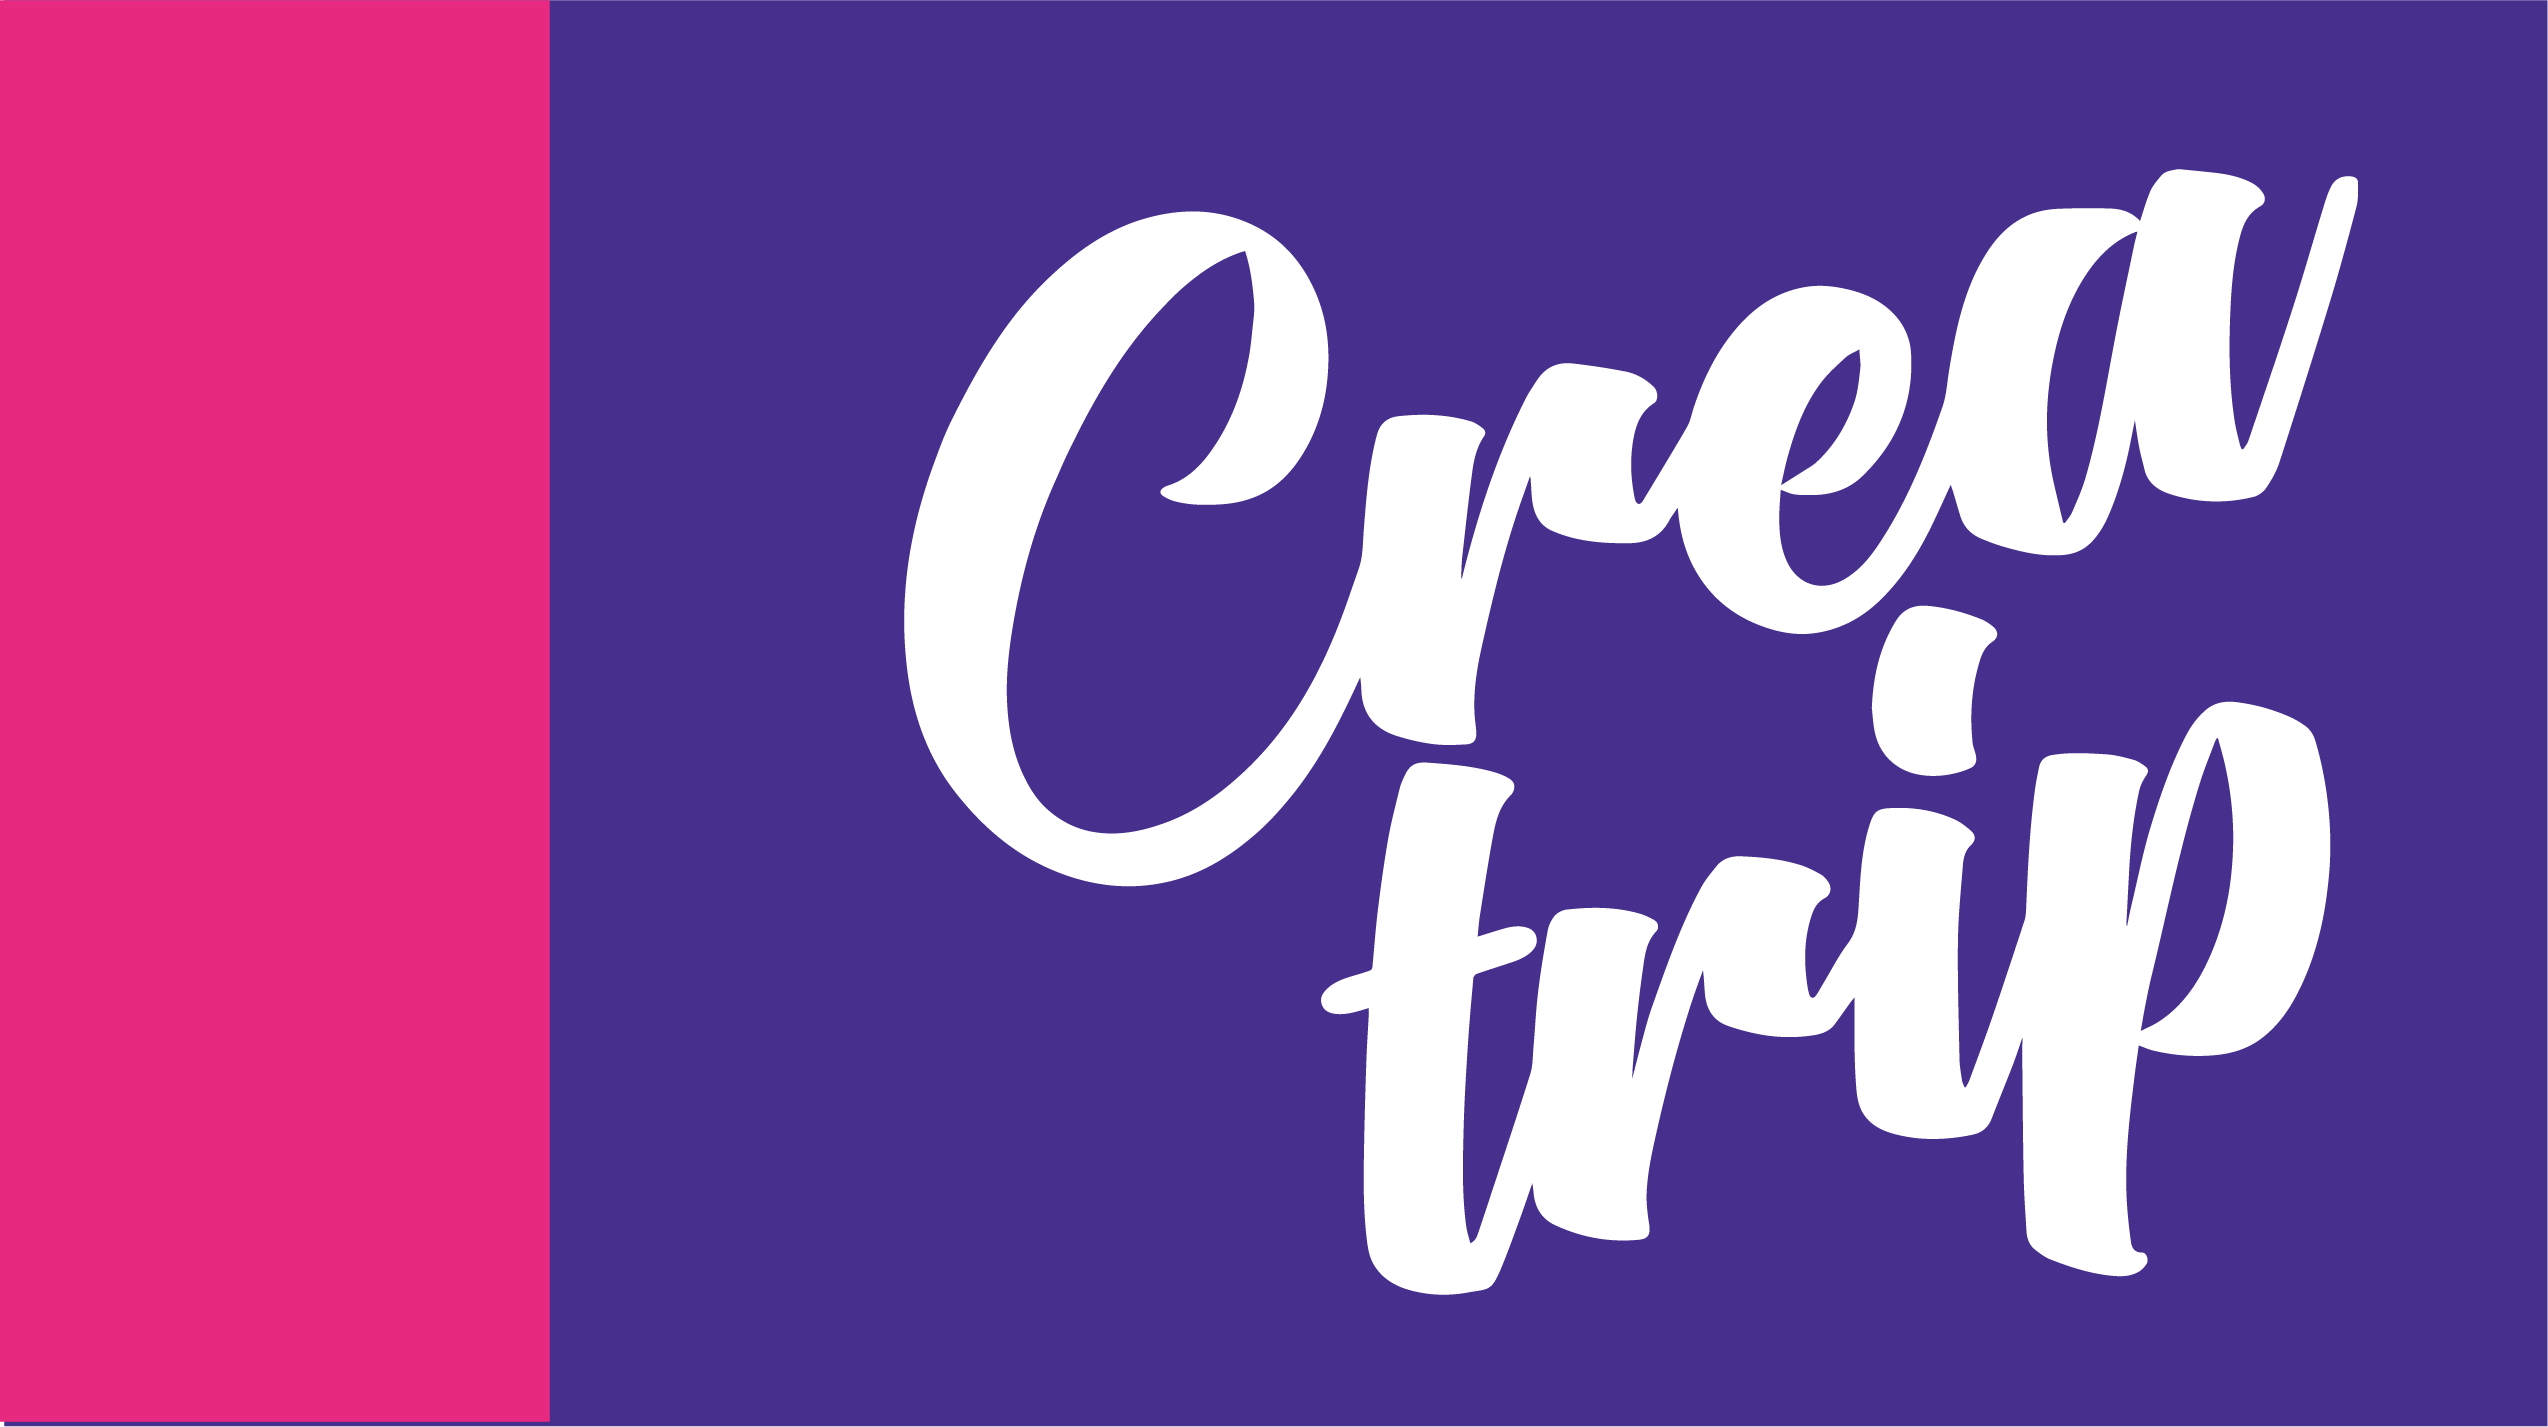 Carl Zeiss Logo sheet • Creatrip %.